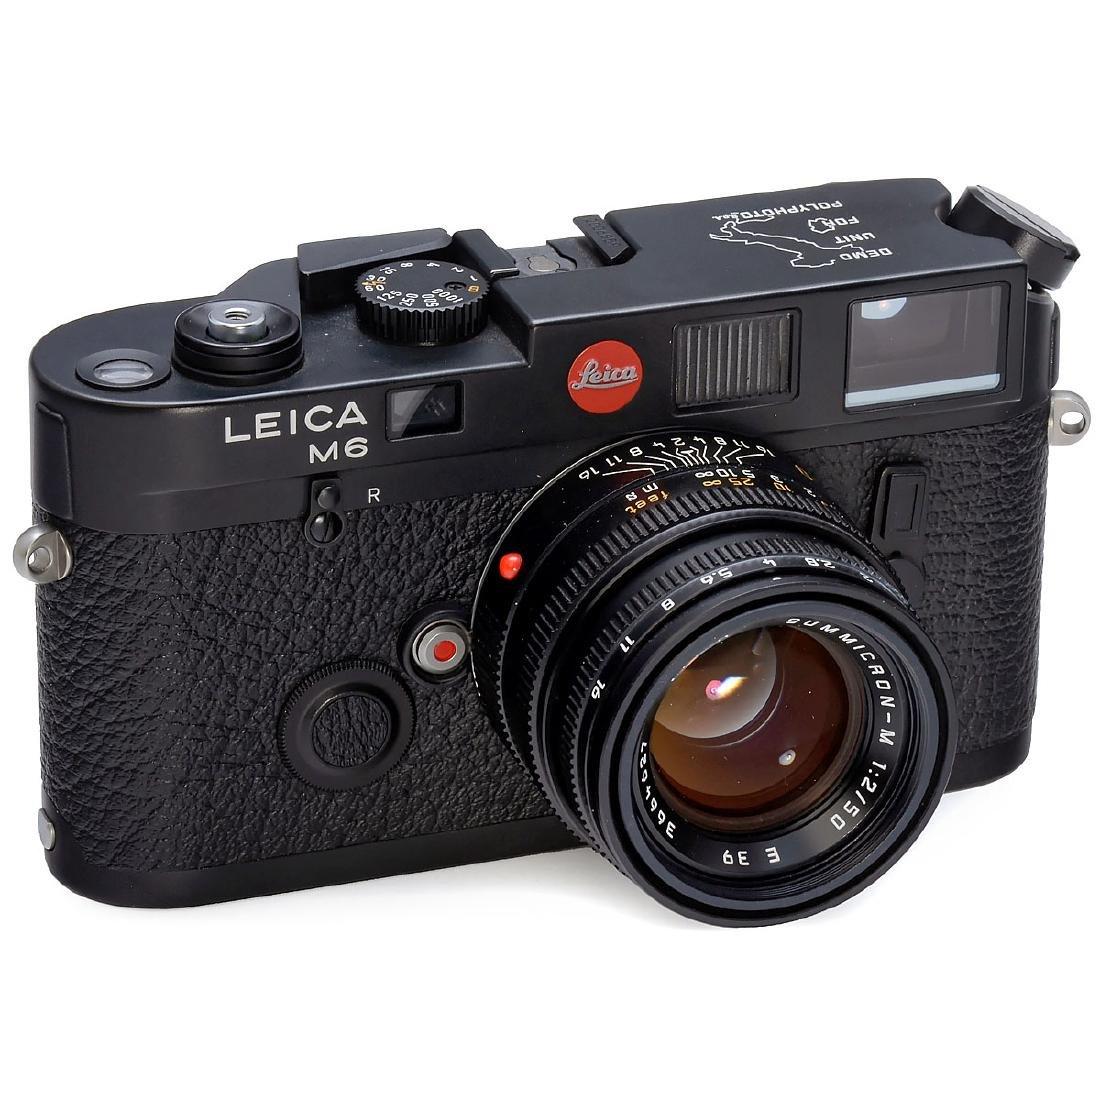 "Leica M6 ""Polyphoto"" with Summicron, 1994"